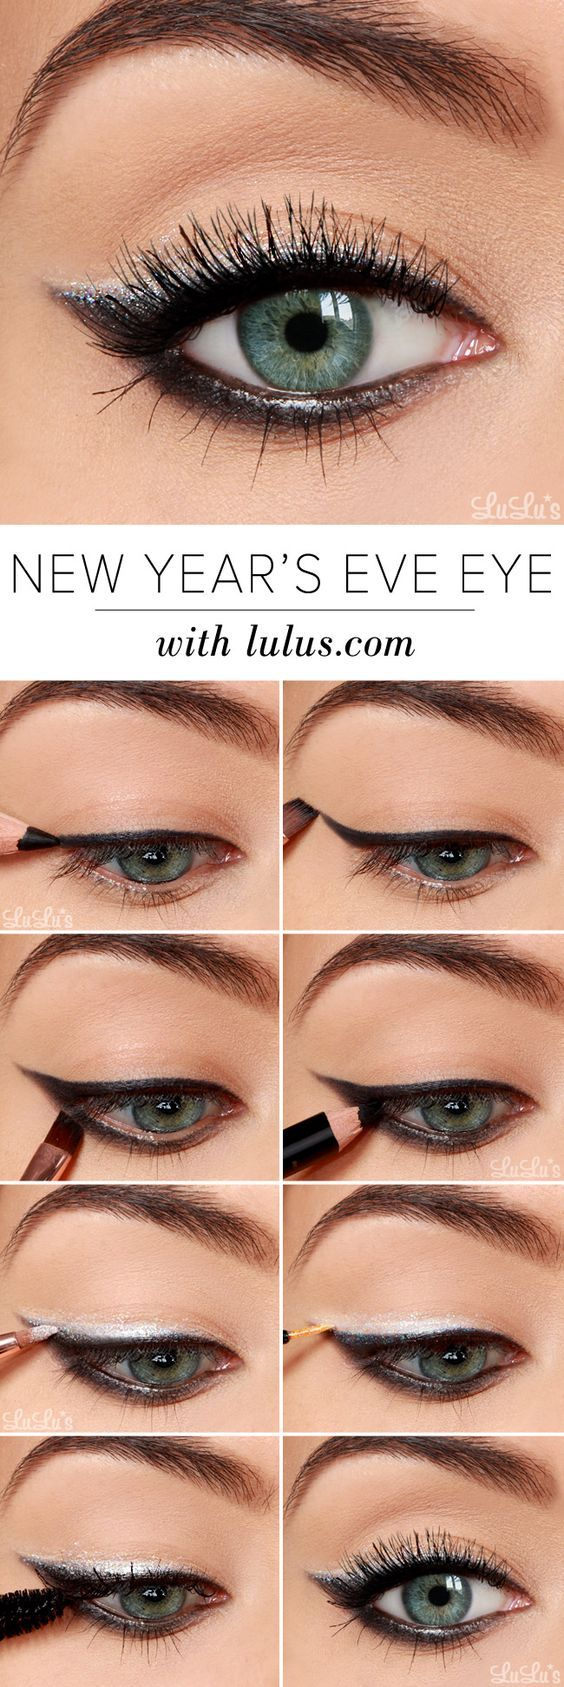 best makeup images on pinterest beauty makeup eye makeup